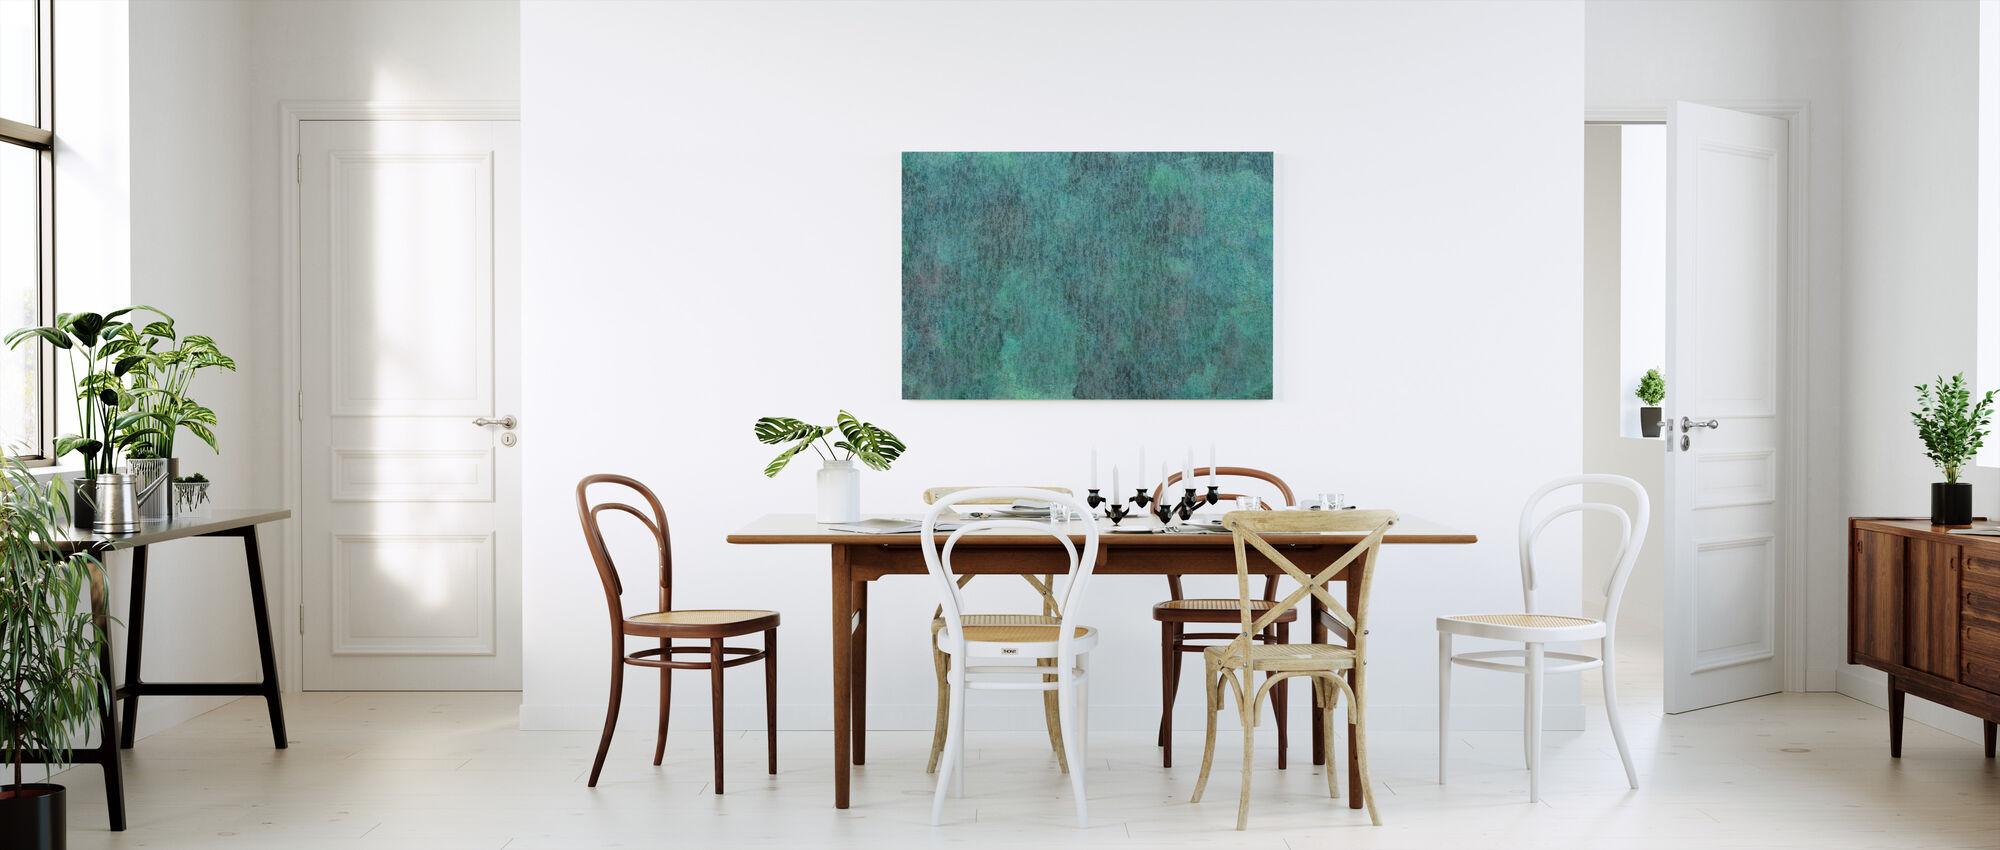 Copper Oxidation on Metal - Canvas print - Kitchen